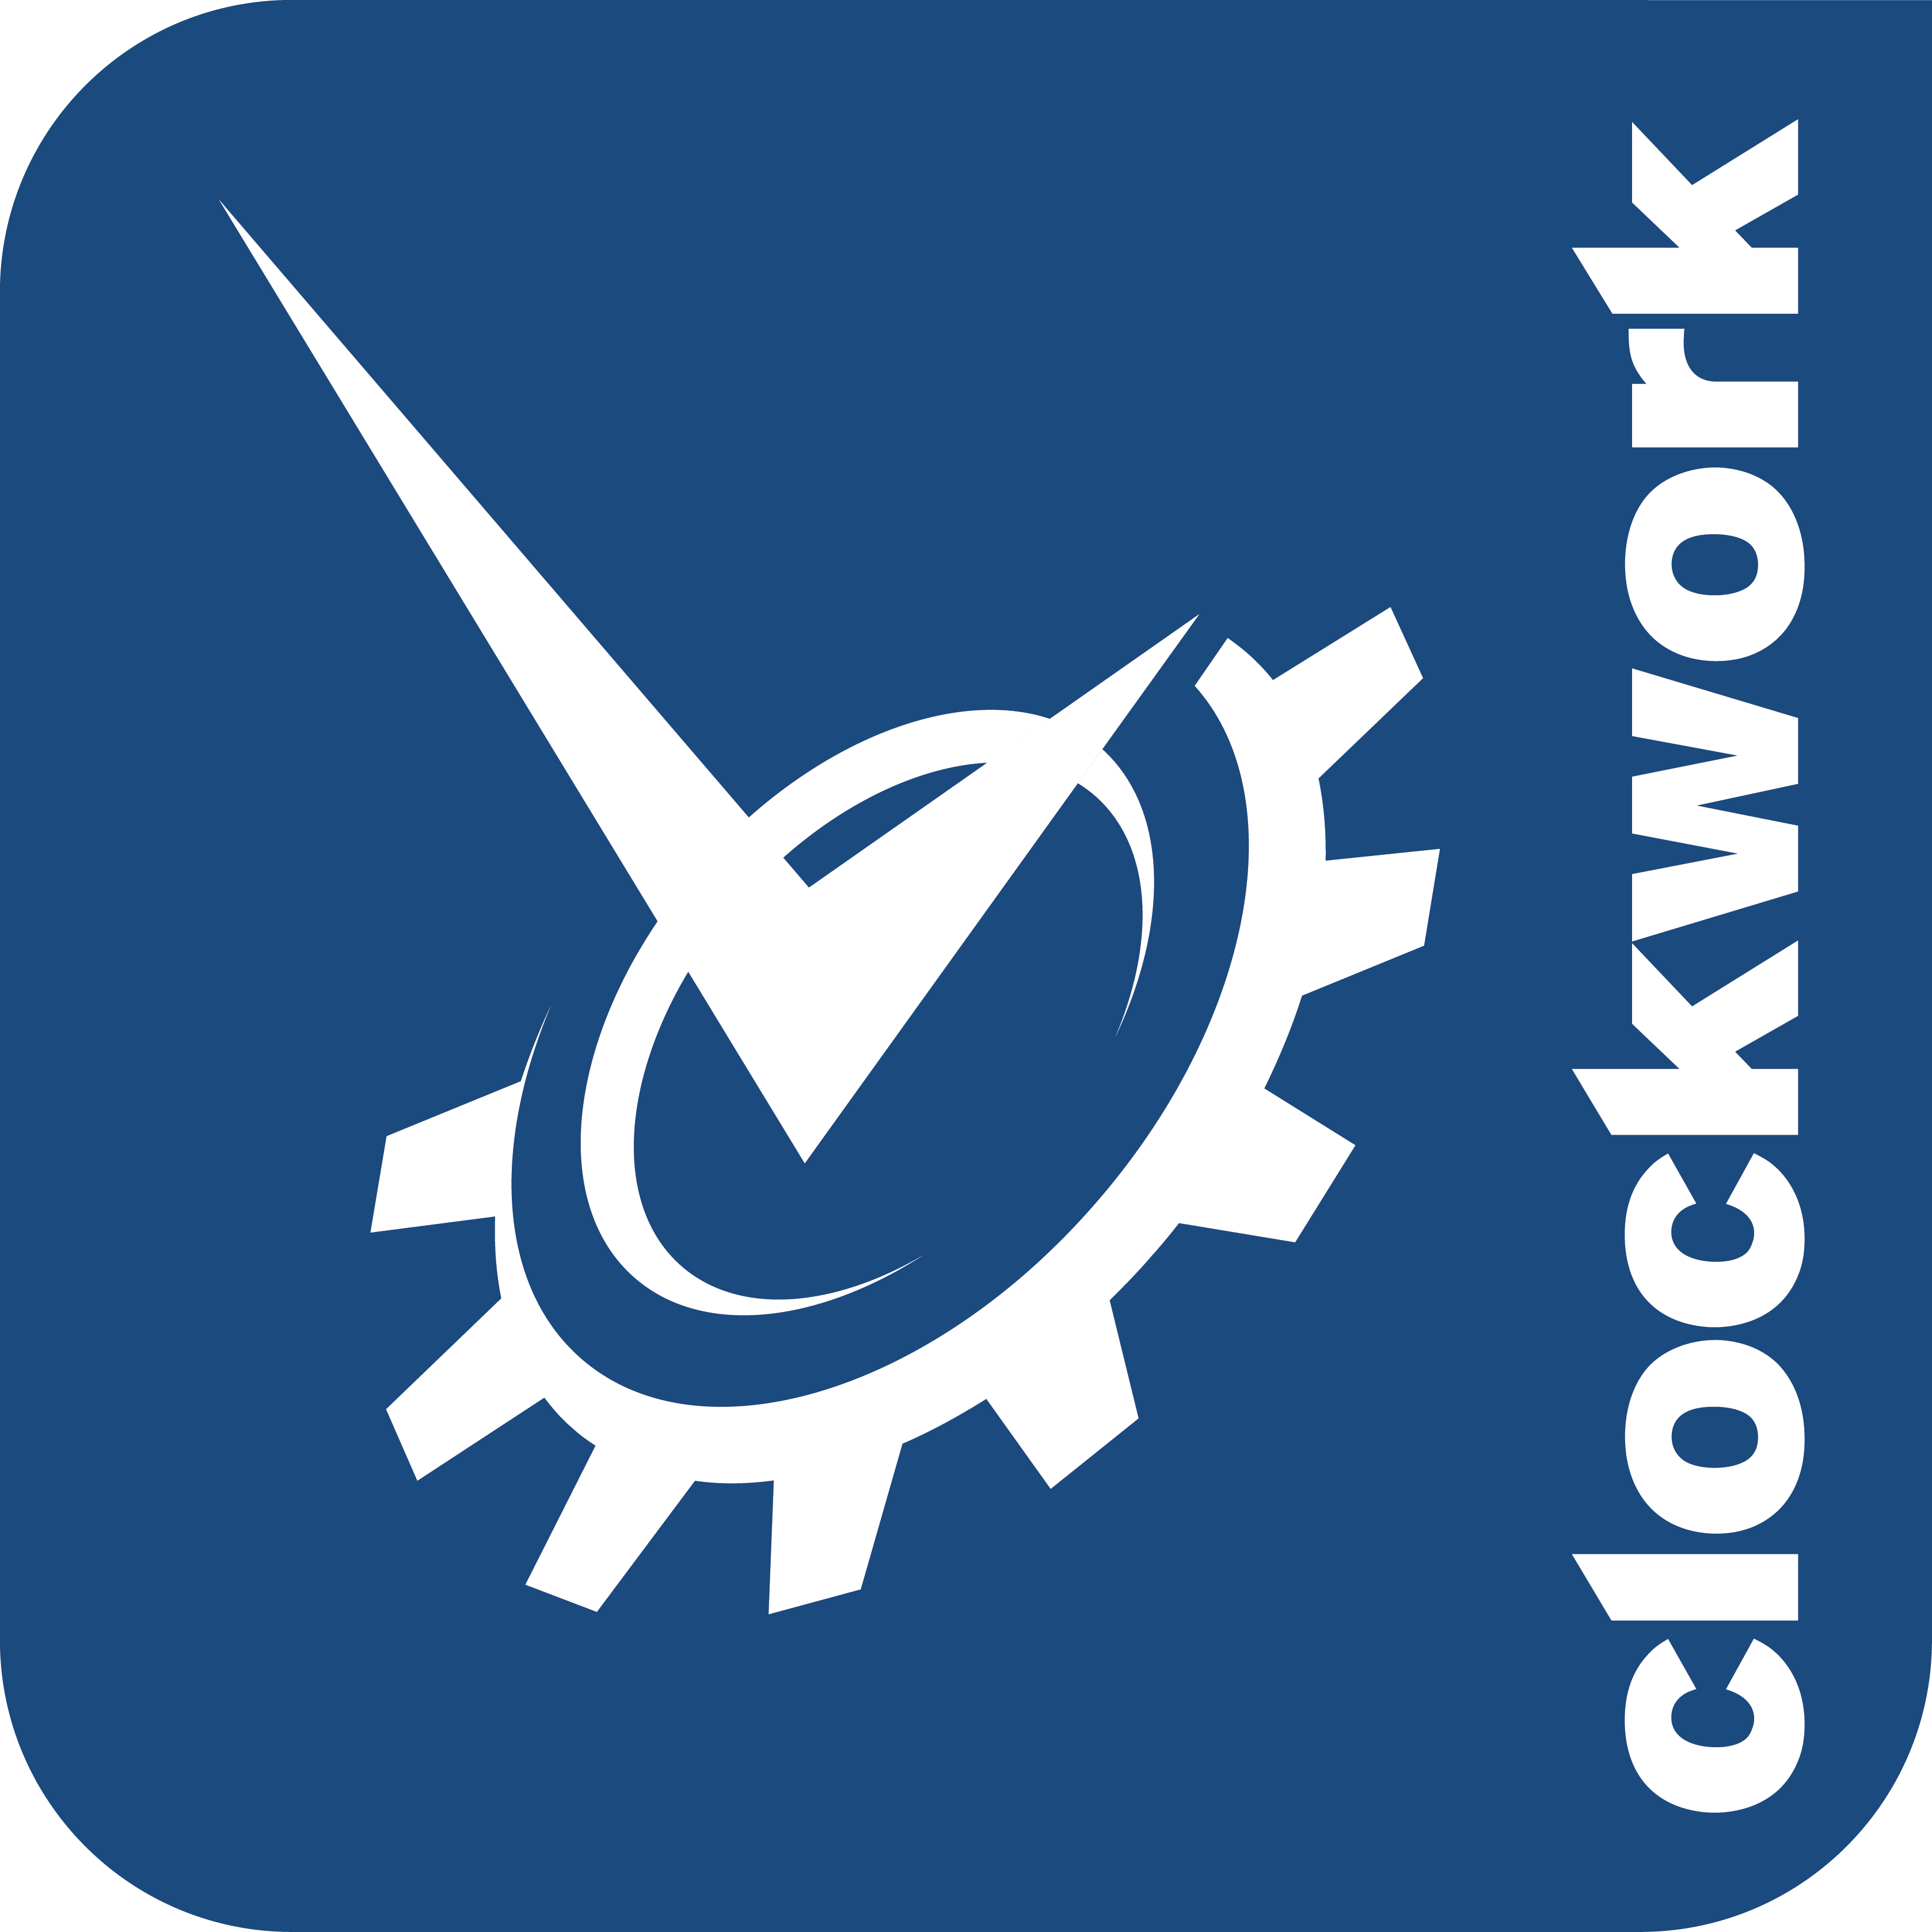 clockwork block blue 2016 logo sap blue